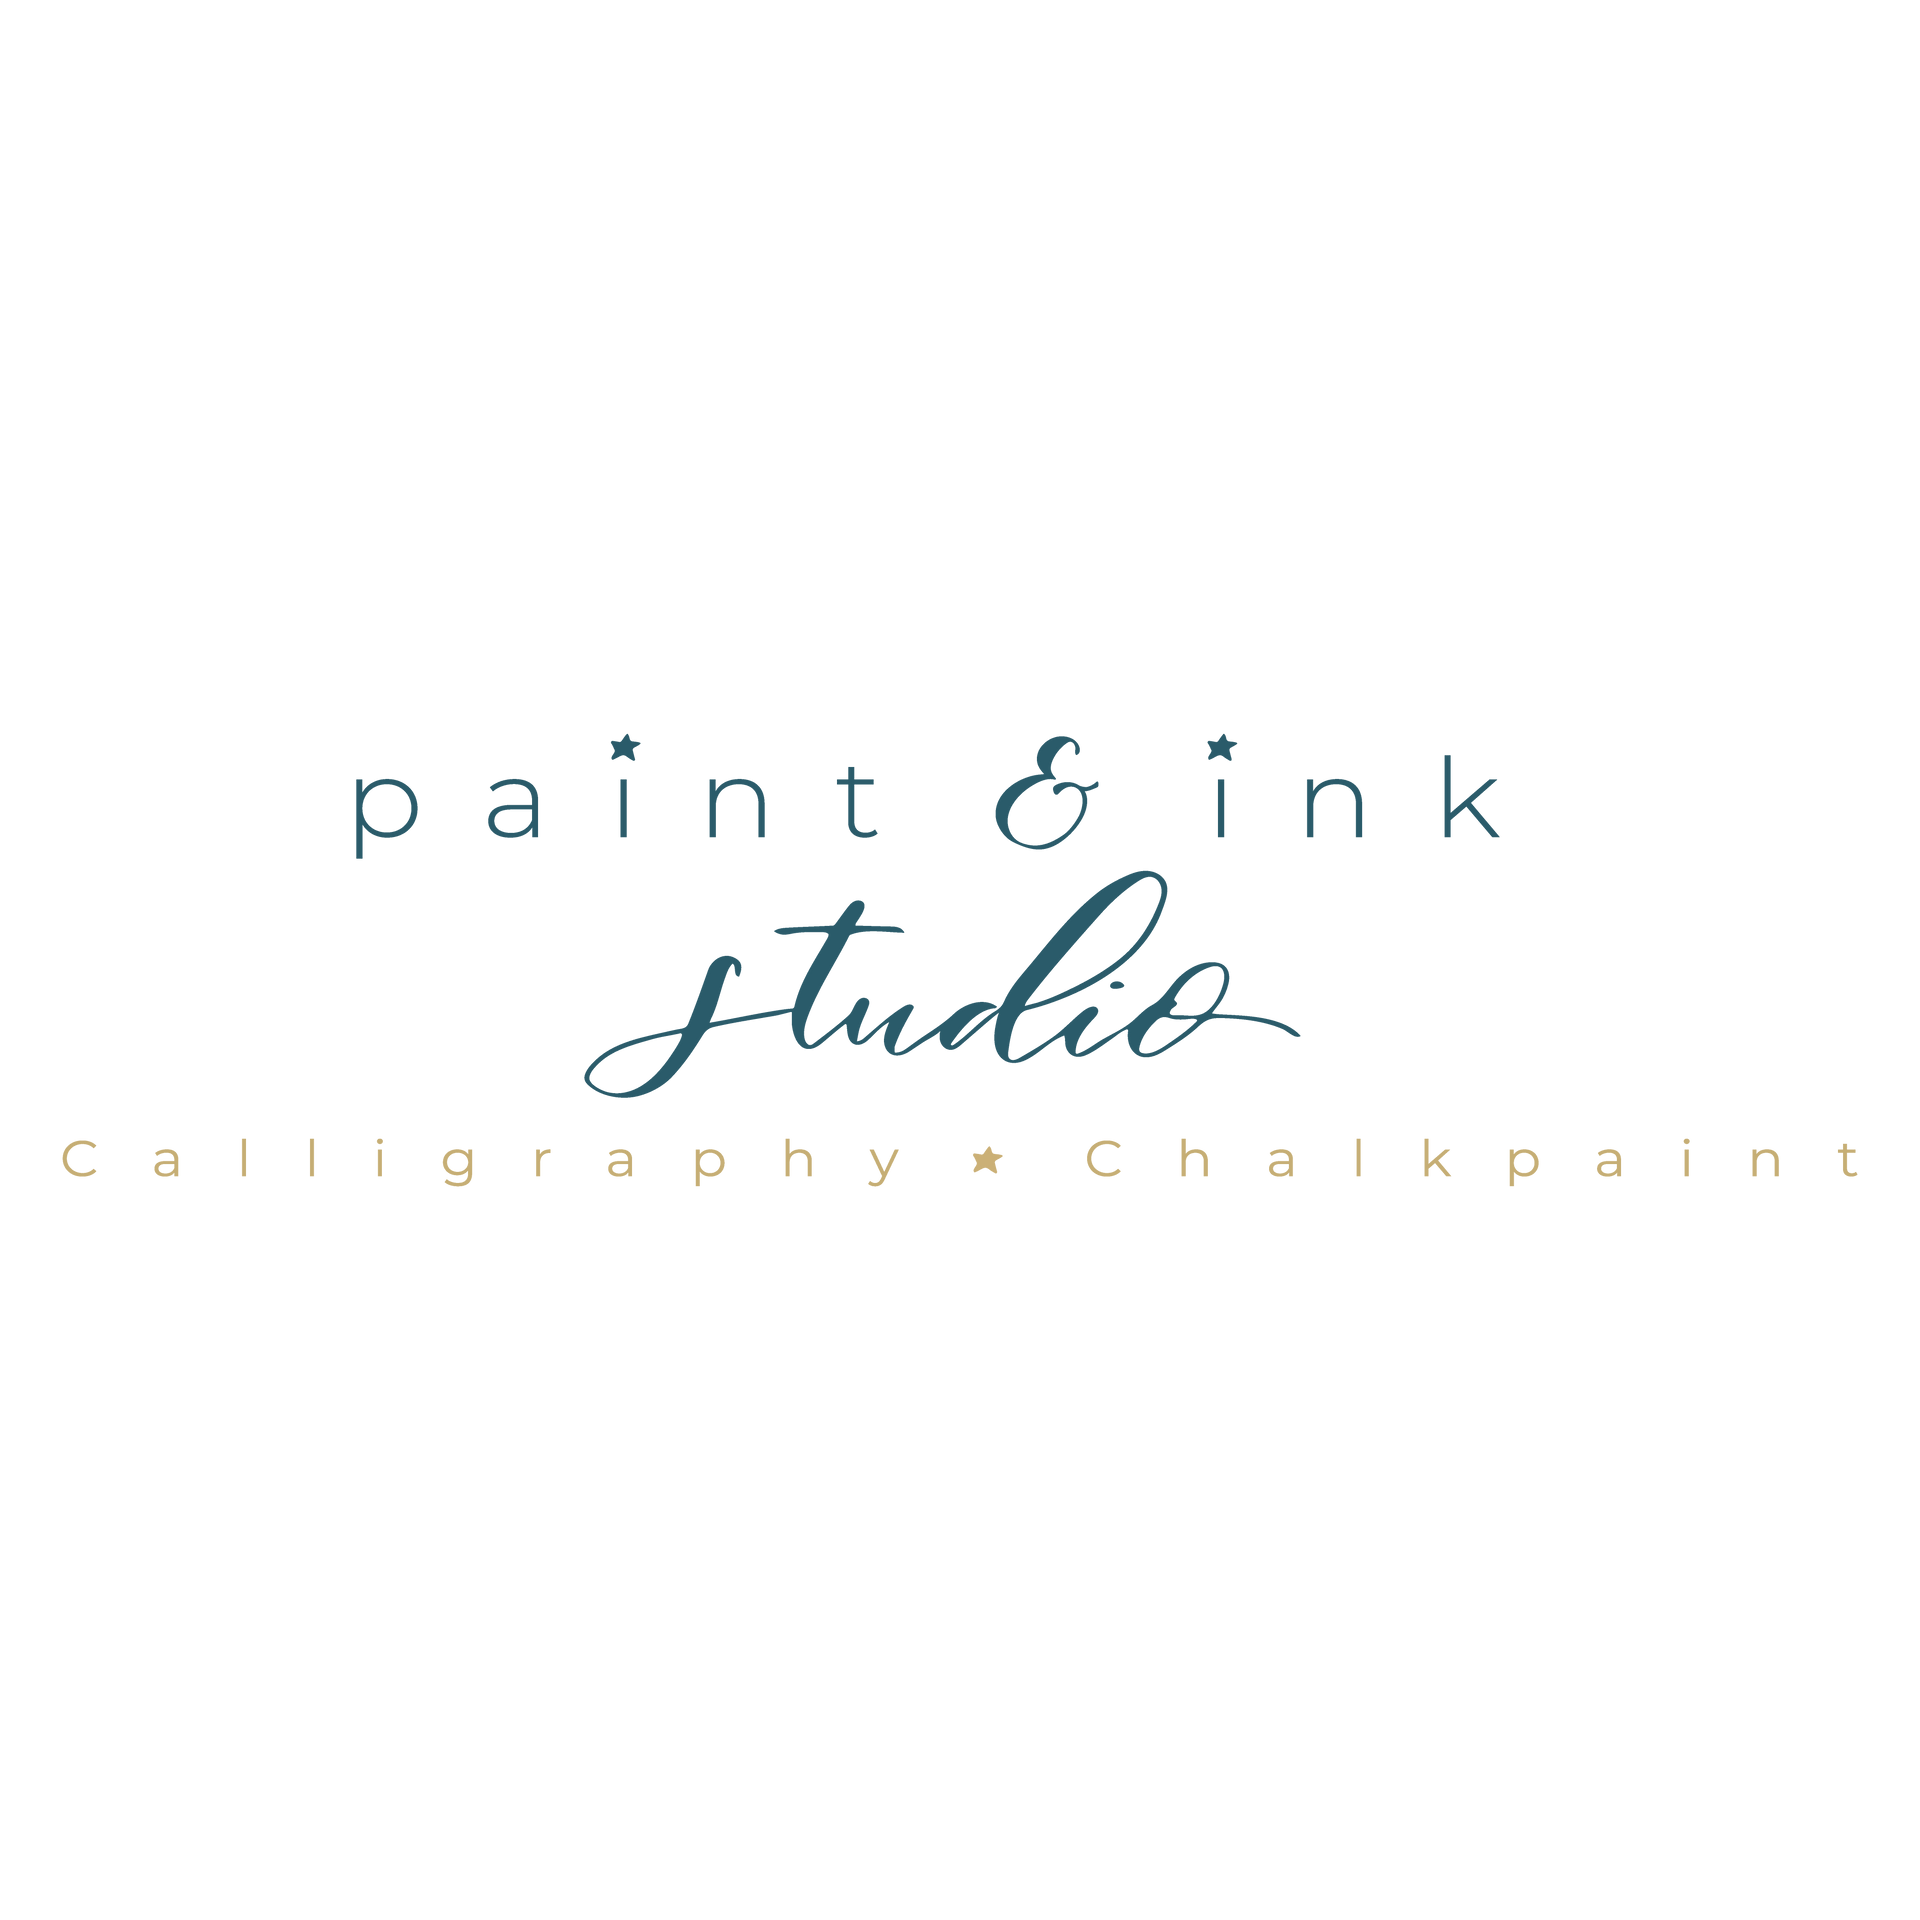 Calligrapher Branding | Brand Identity Design by Fresh Leaf Creative